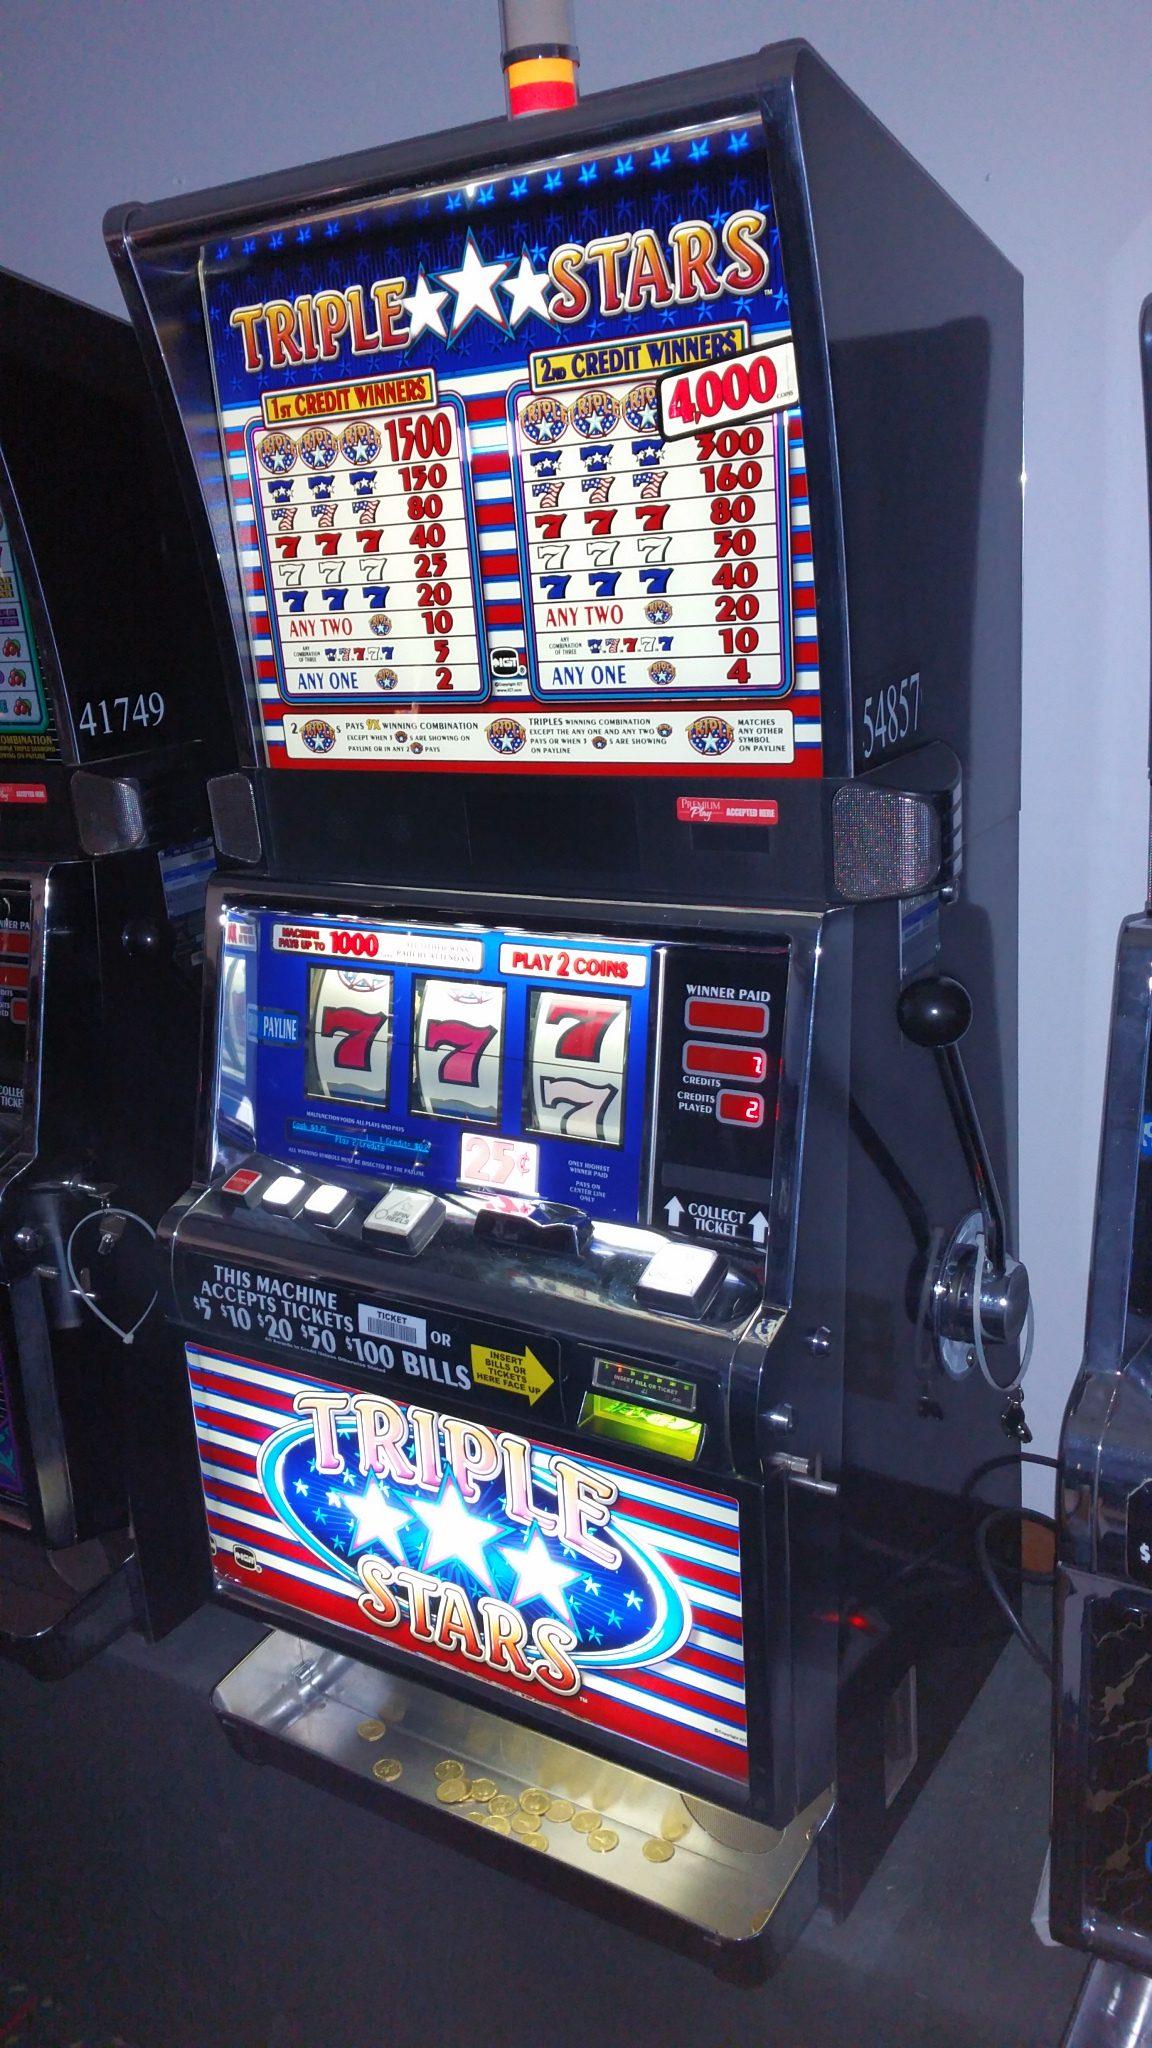 IGT S2000 Triple Stars 2 Coin Quater Slot Machine